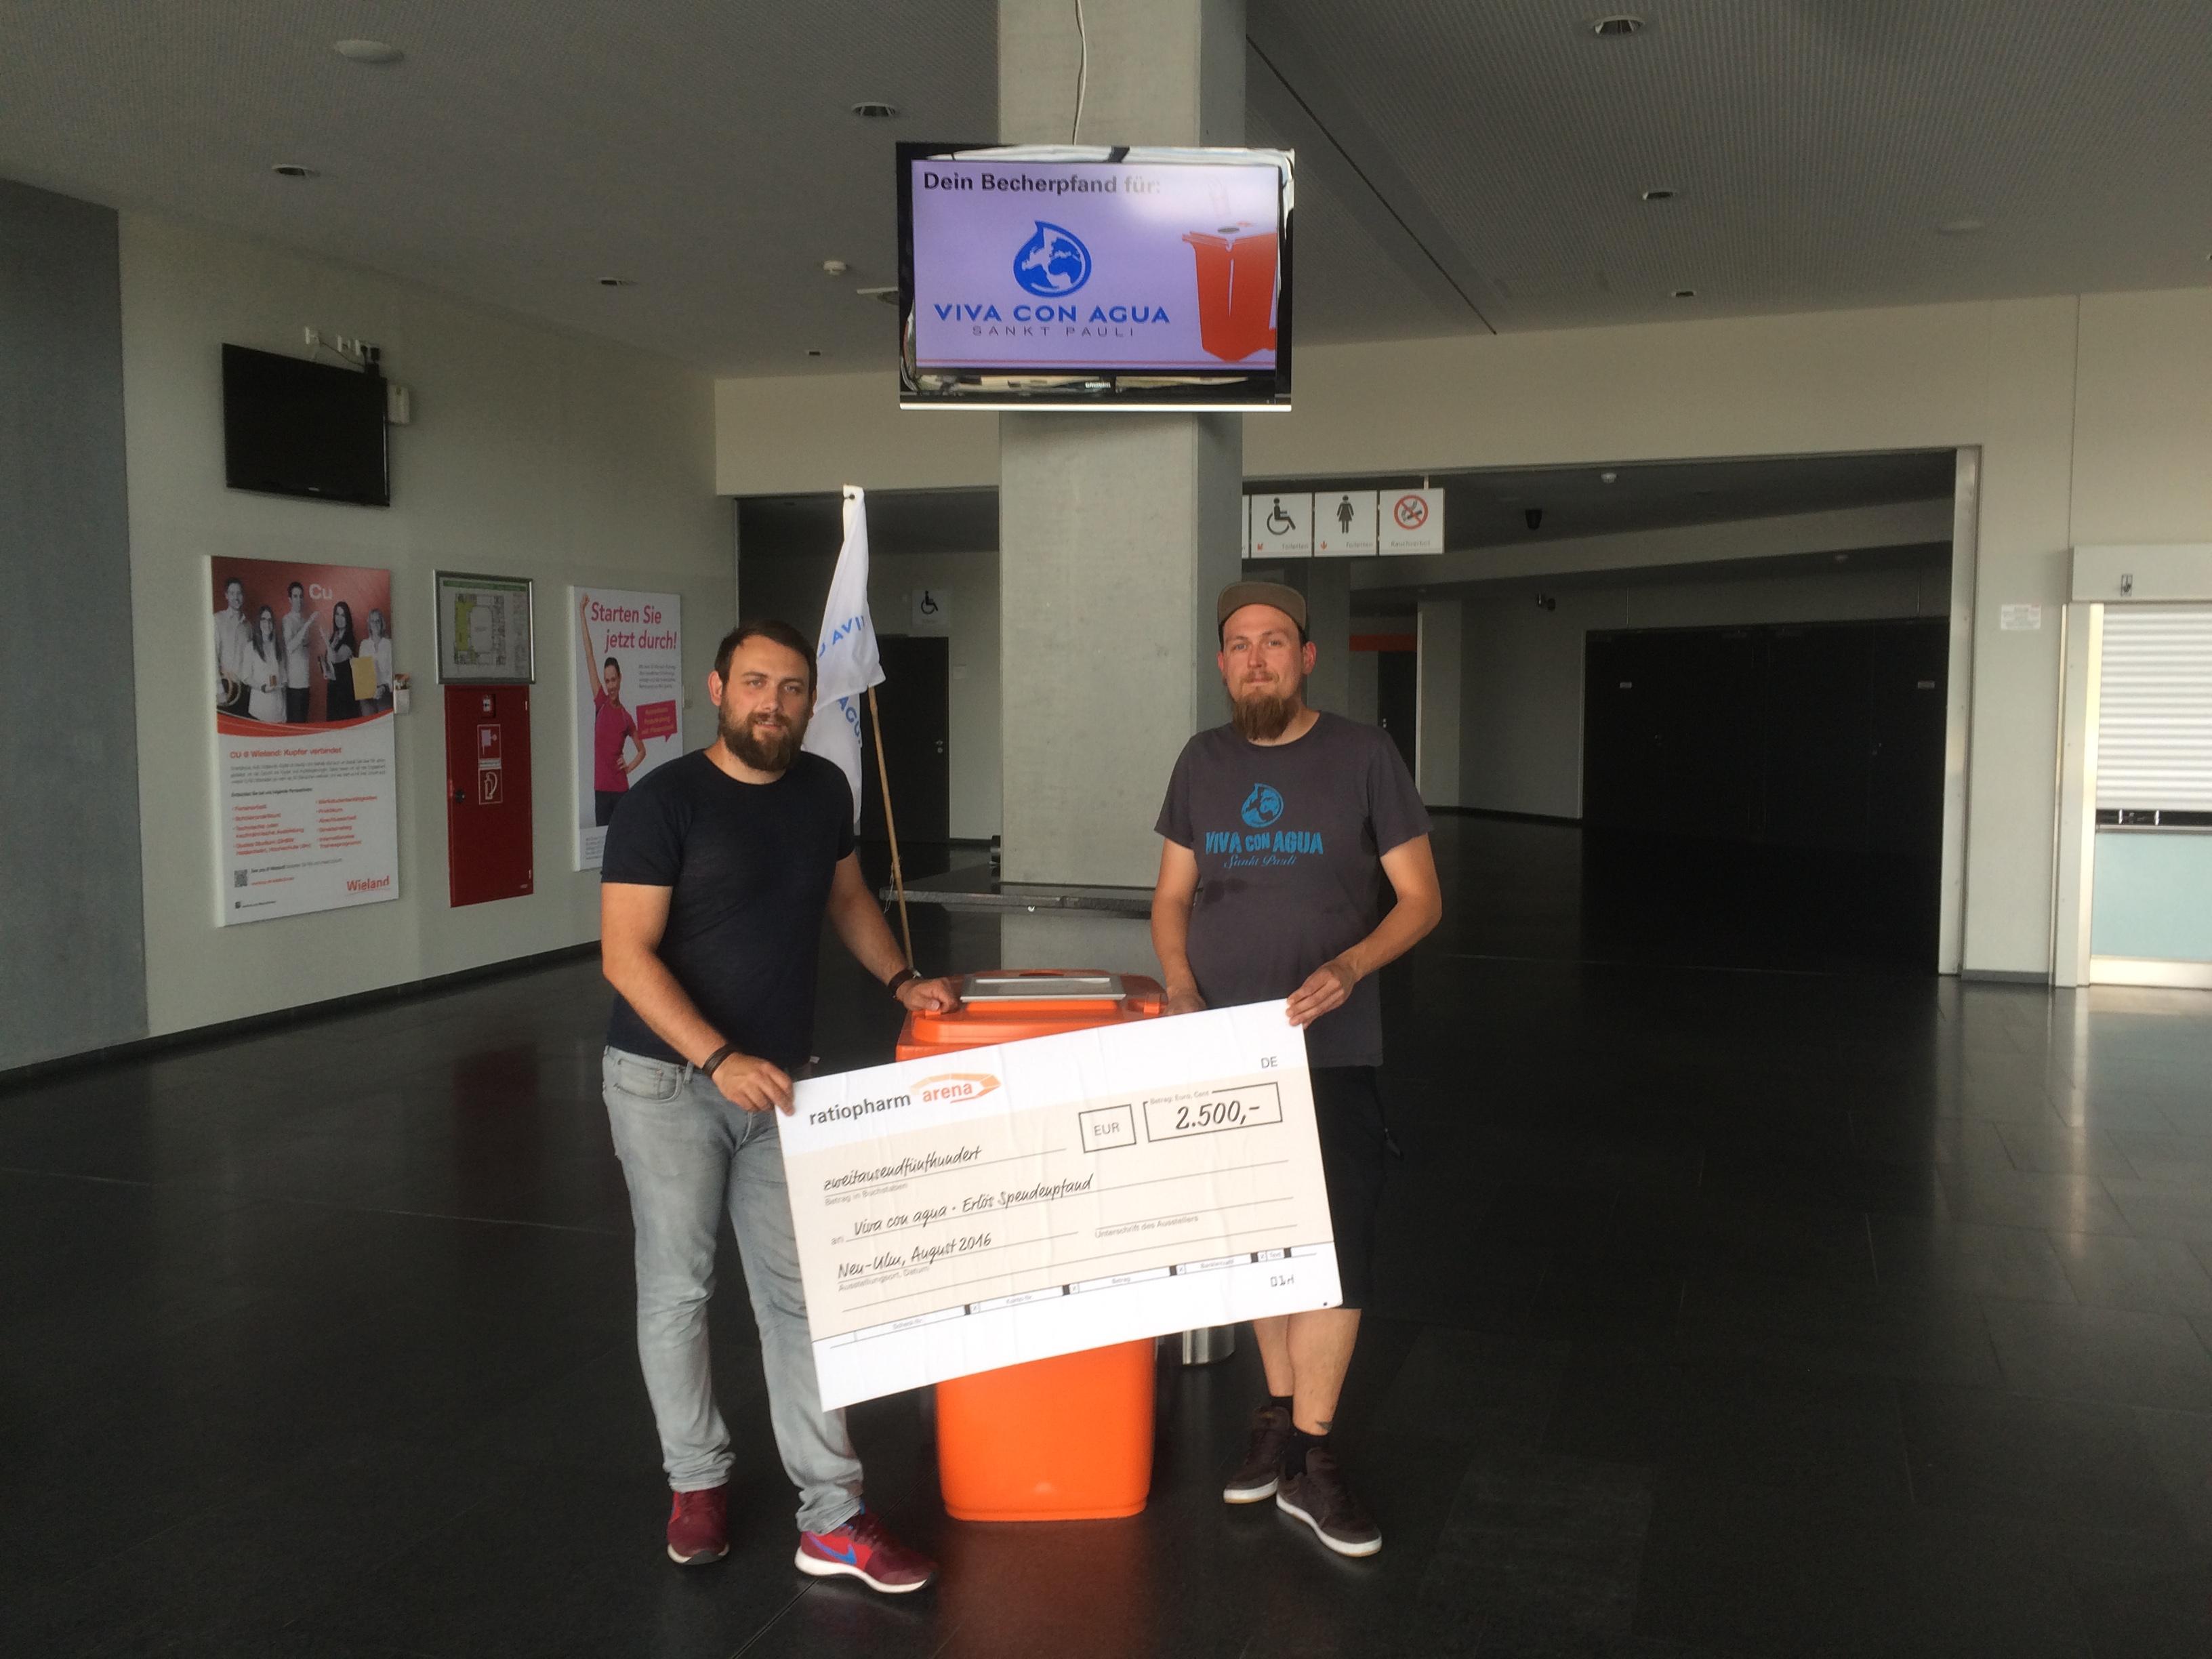 Ratiopharm Arena Ulmneu Ulm Spende Für Viva Con Agua